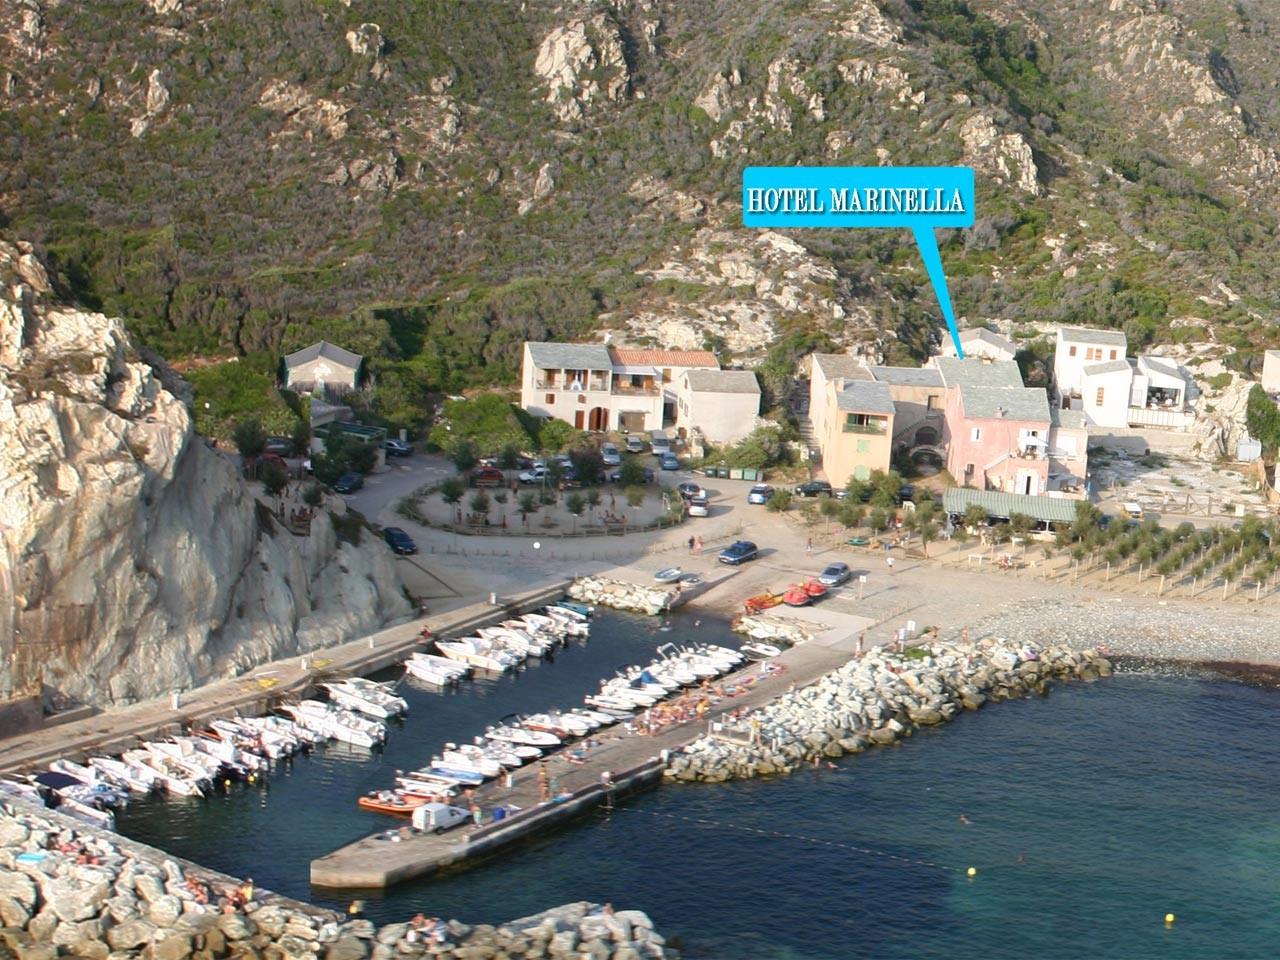 Marinella - Location Bateaux / Kayaks -Marine de Giottani - Barrettali